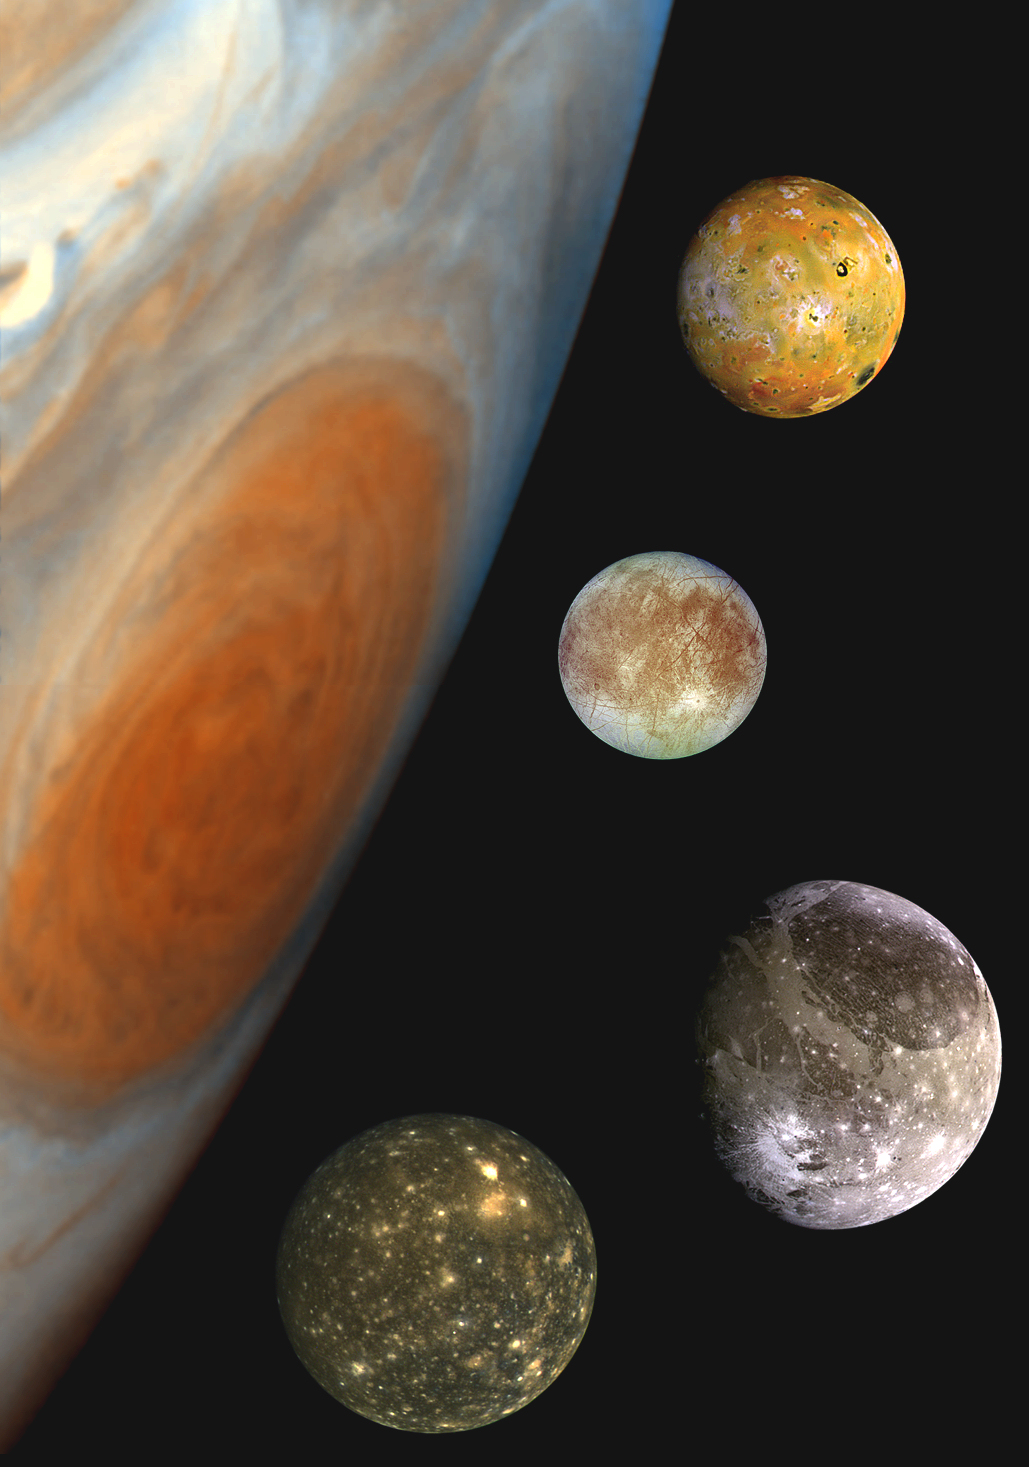 1567214644364-JUICE_Jupiter_Galilean_Moons_PIA00600.jpg